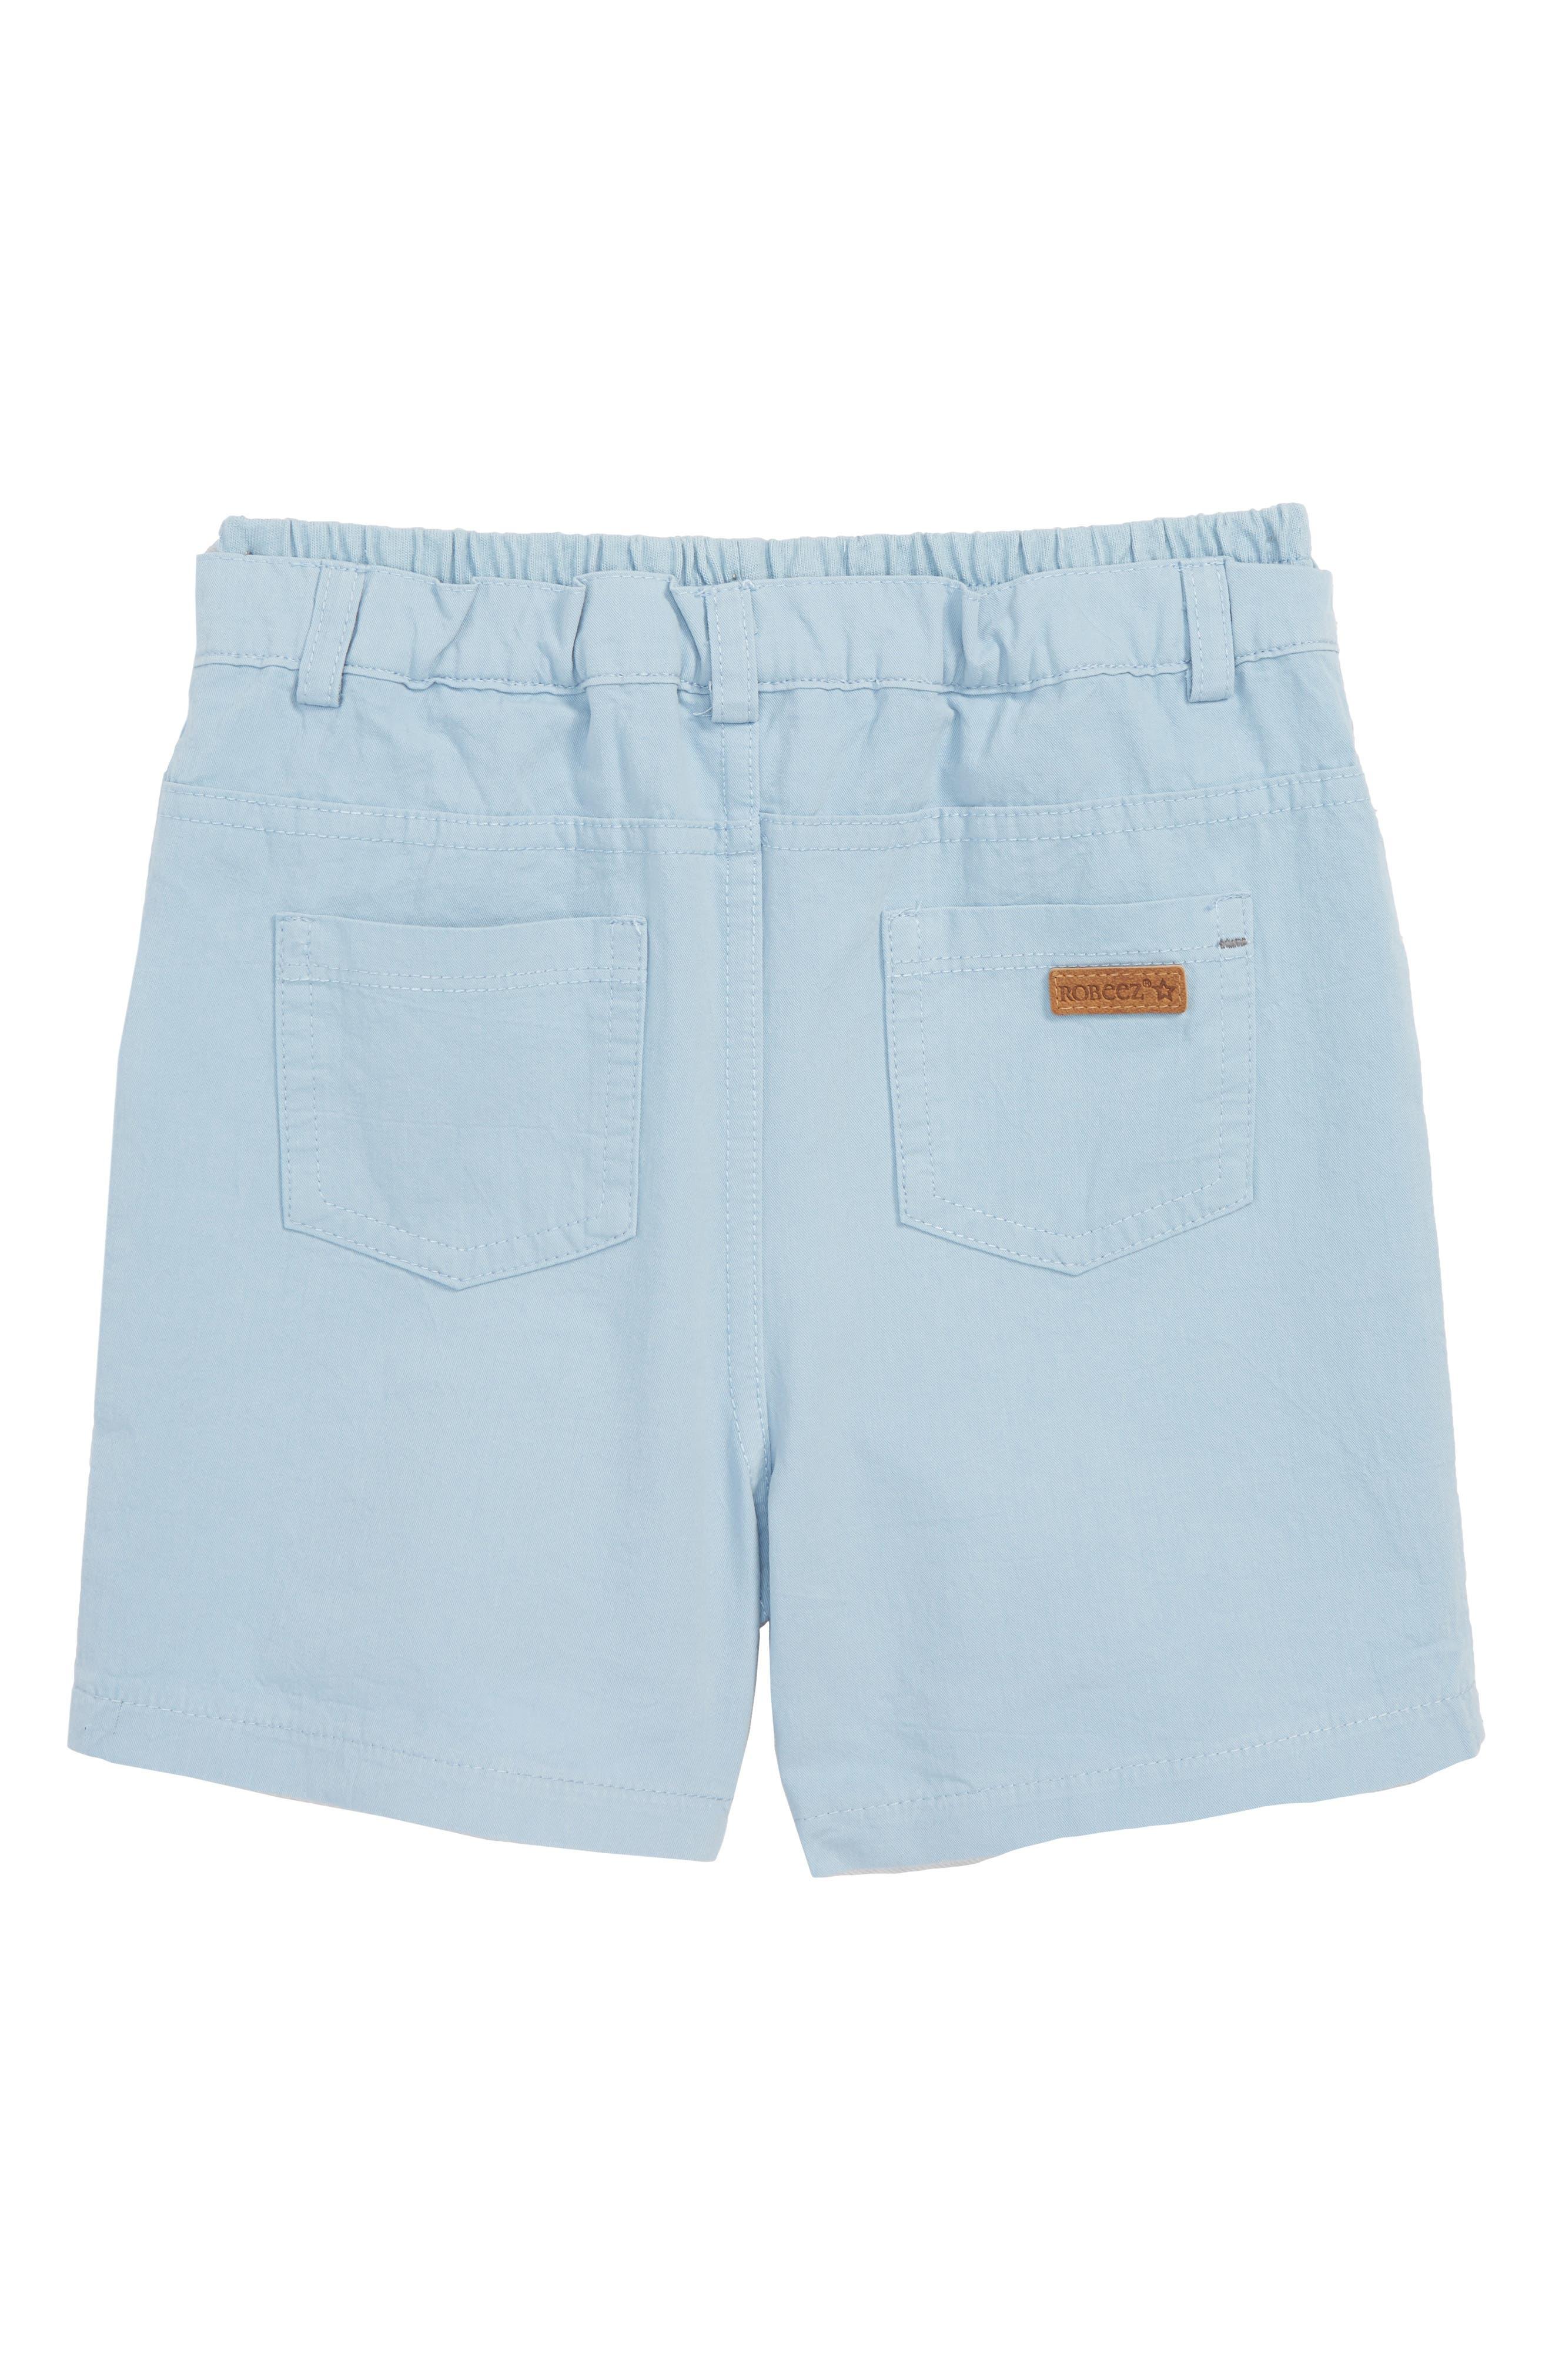 Enjoy Shorts,                             Alternate thumbnail 2, color,                             420